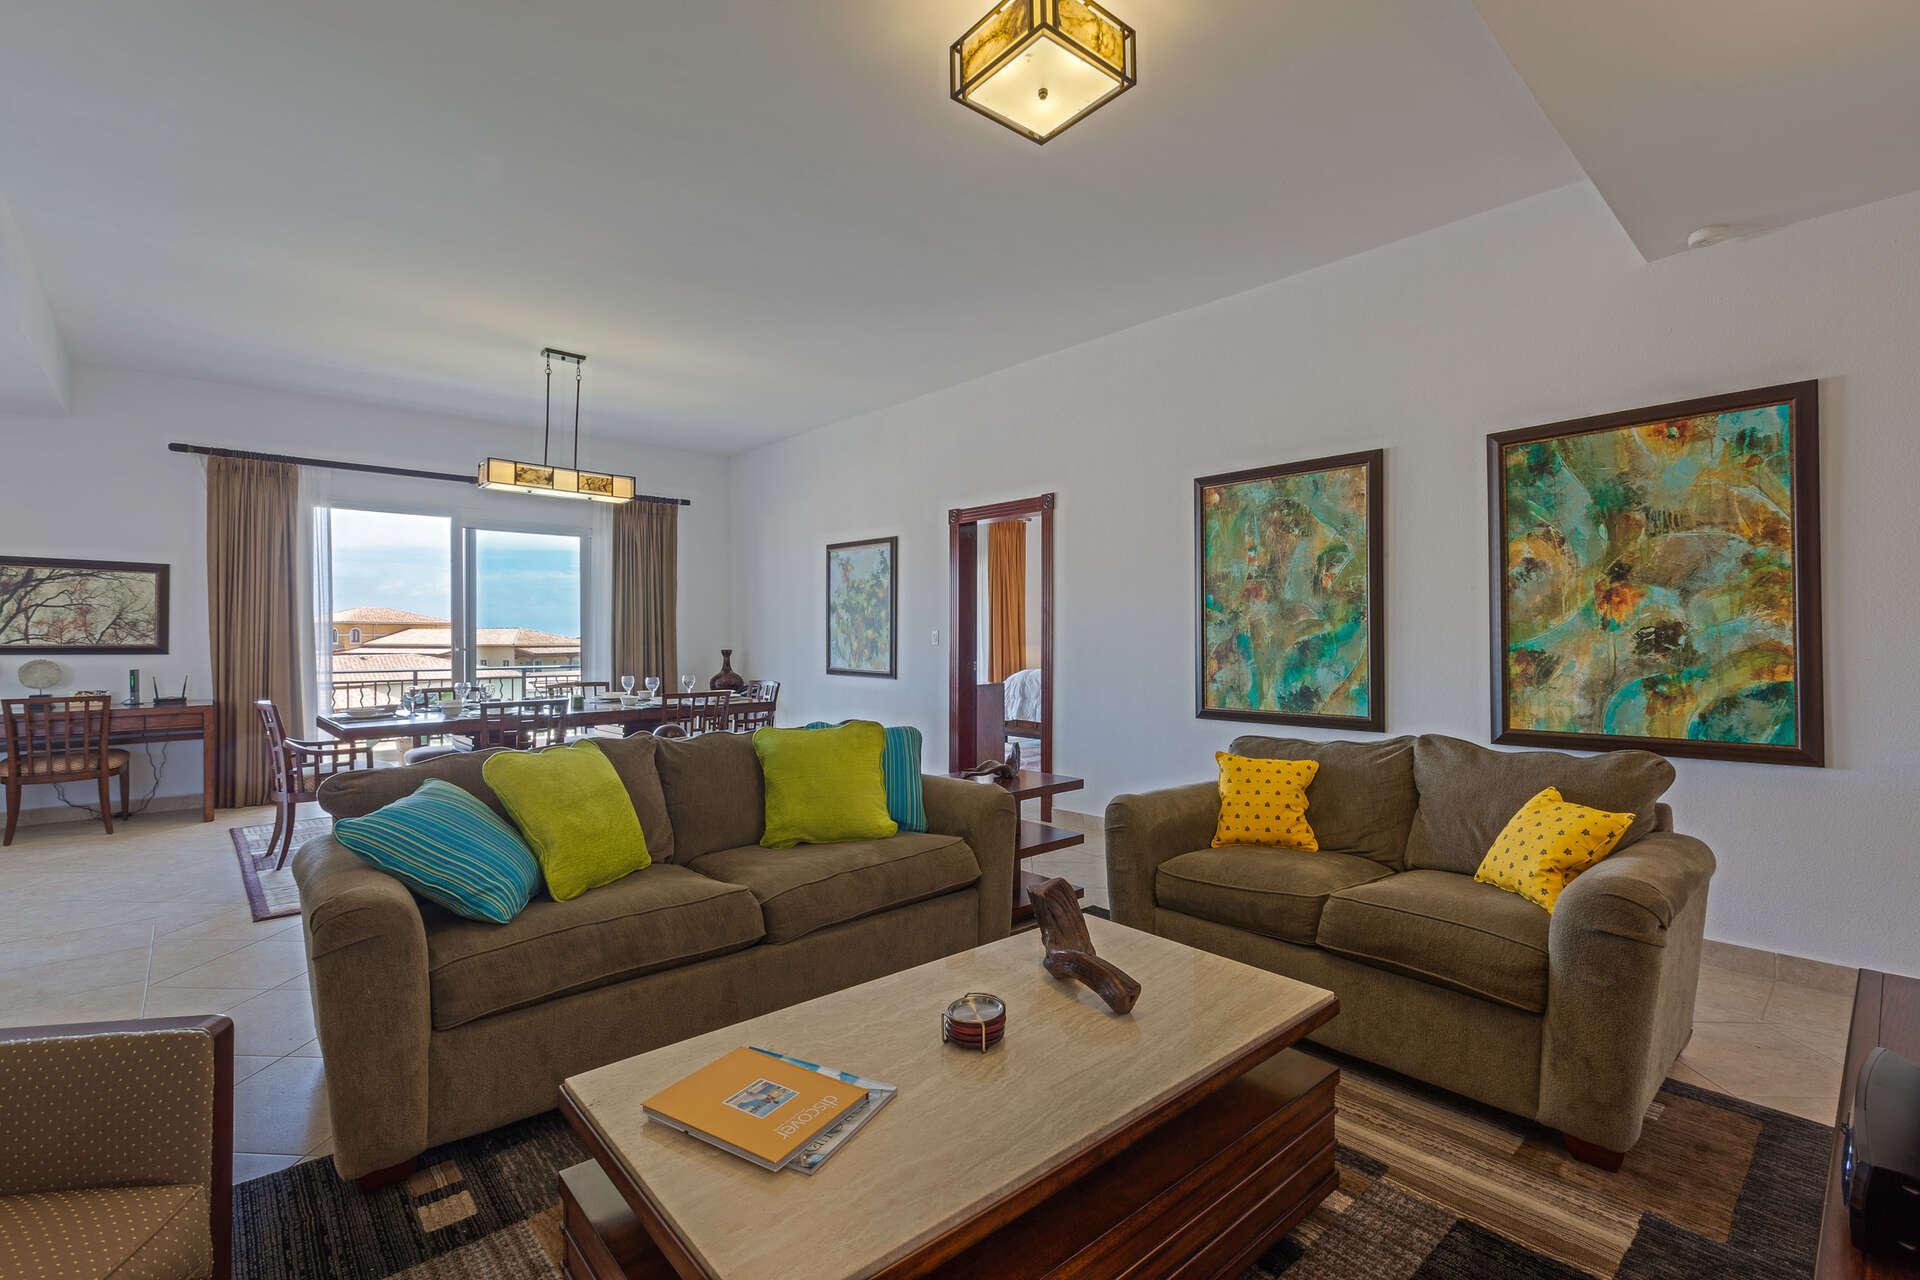 Luxury villa rentals caribbean - St martin - Sint maarten - Cupecoy - Figueira Condo - Image 1/14